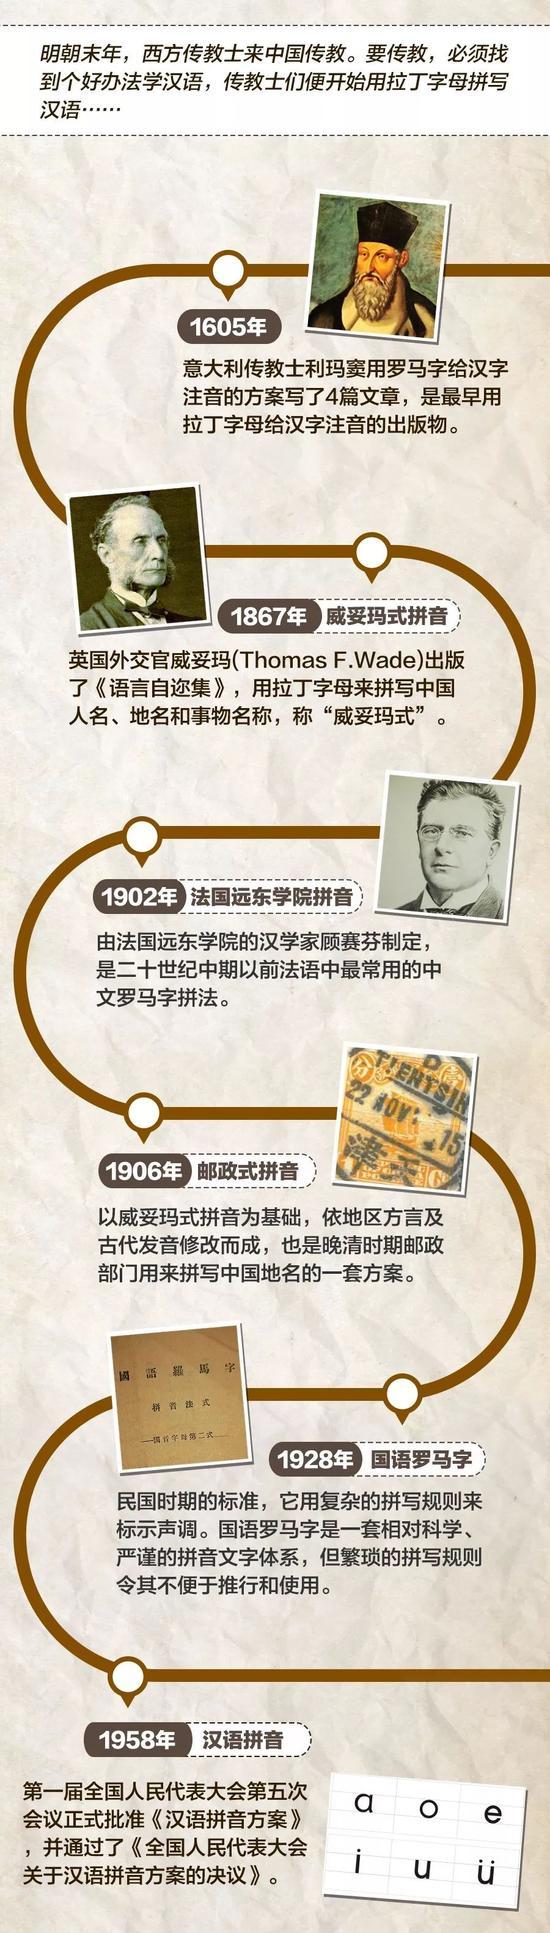 Qingdao还是Tsingtao 哪个才是青岛真正英文名?